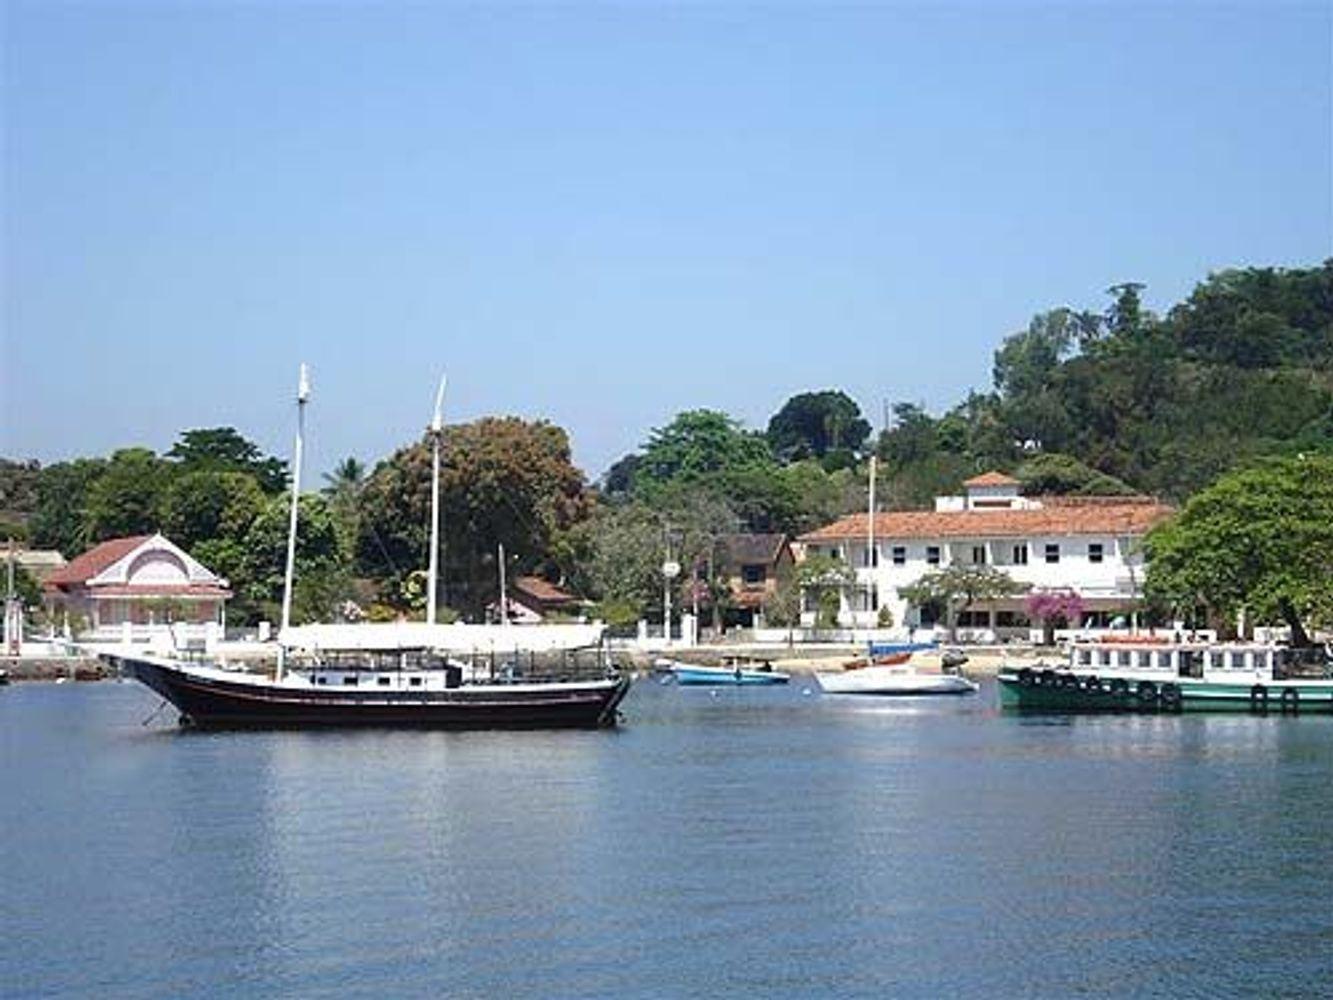 Paqueta - The Forgoten Island